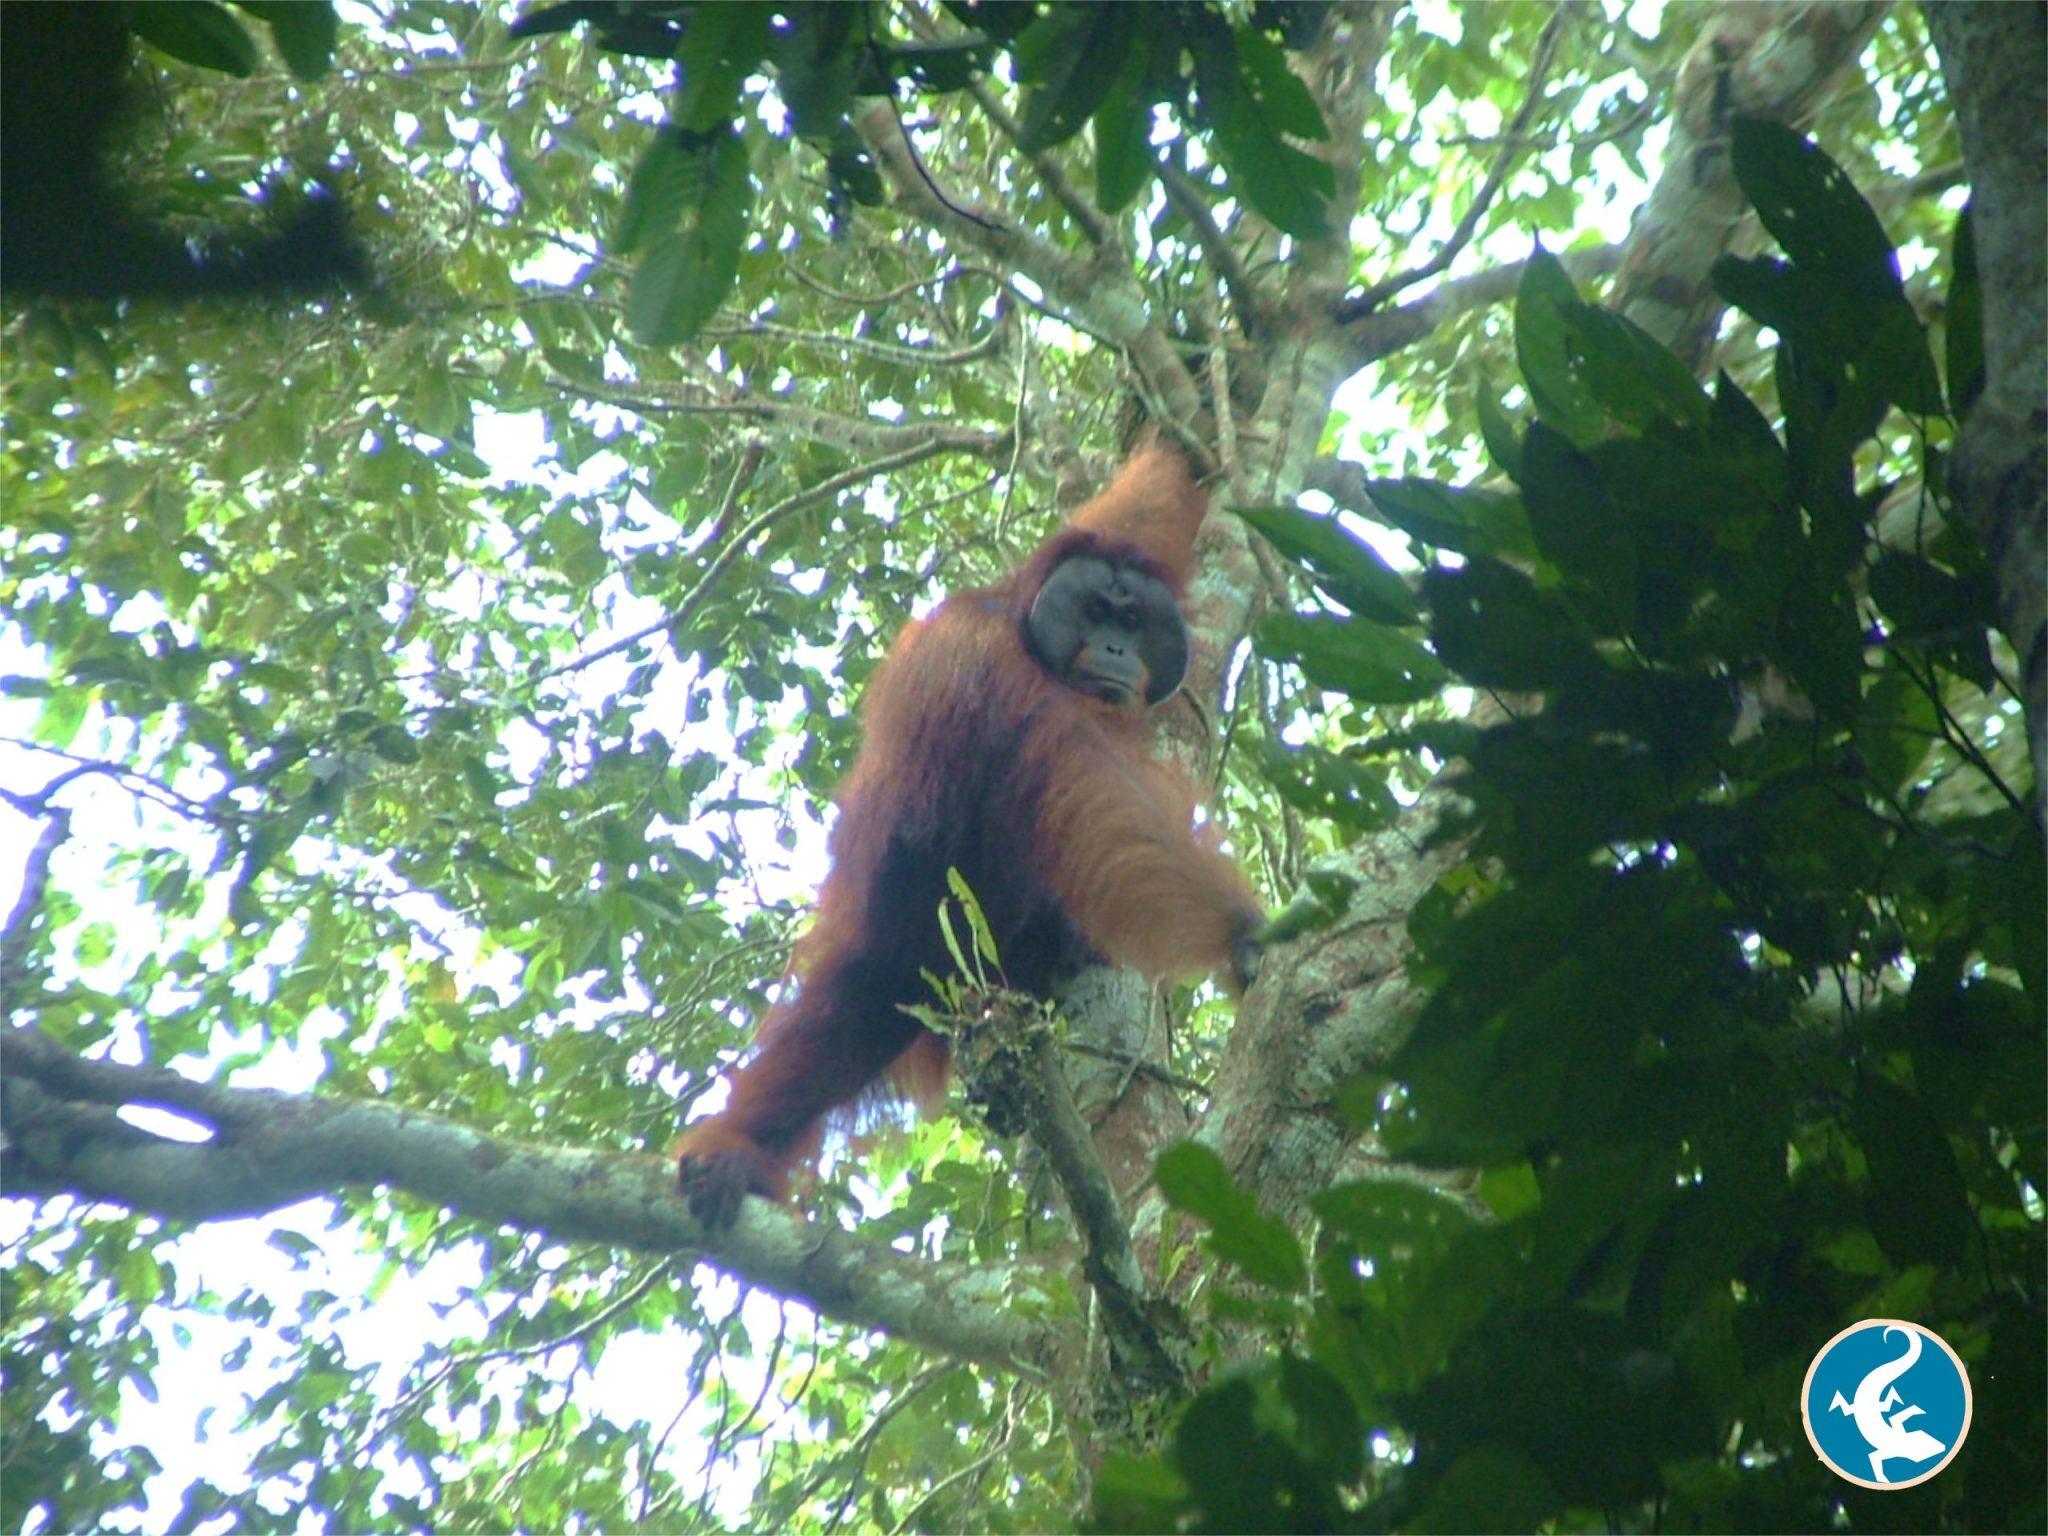 Bornean orangutan in tree in the wild